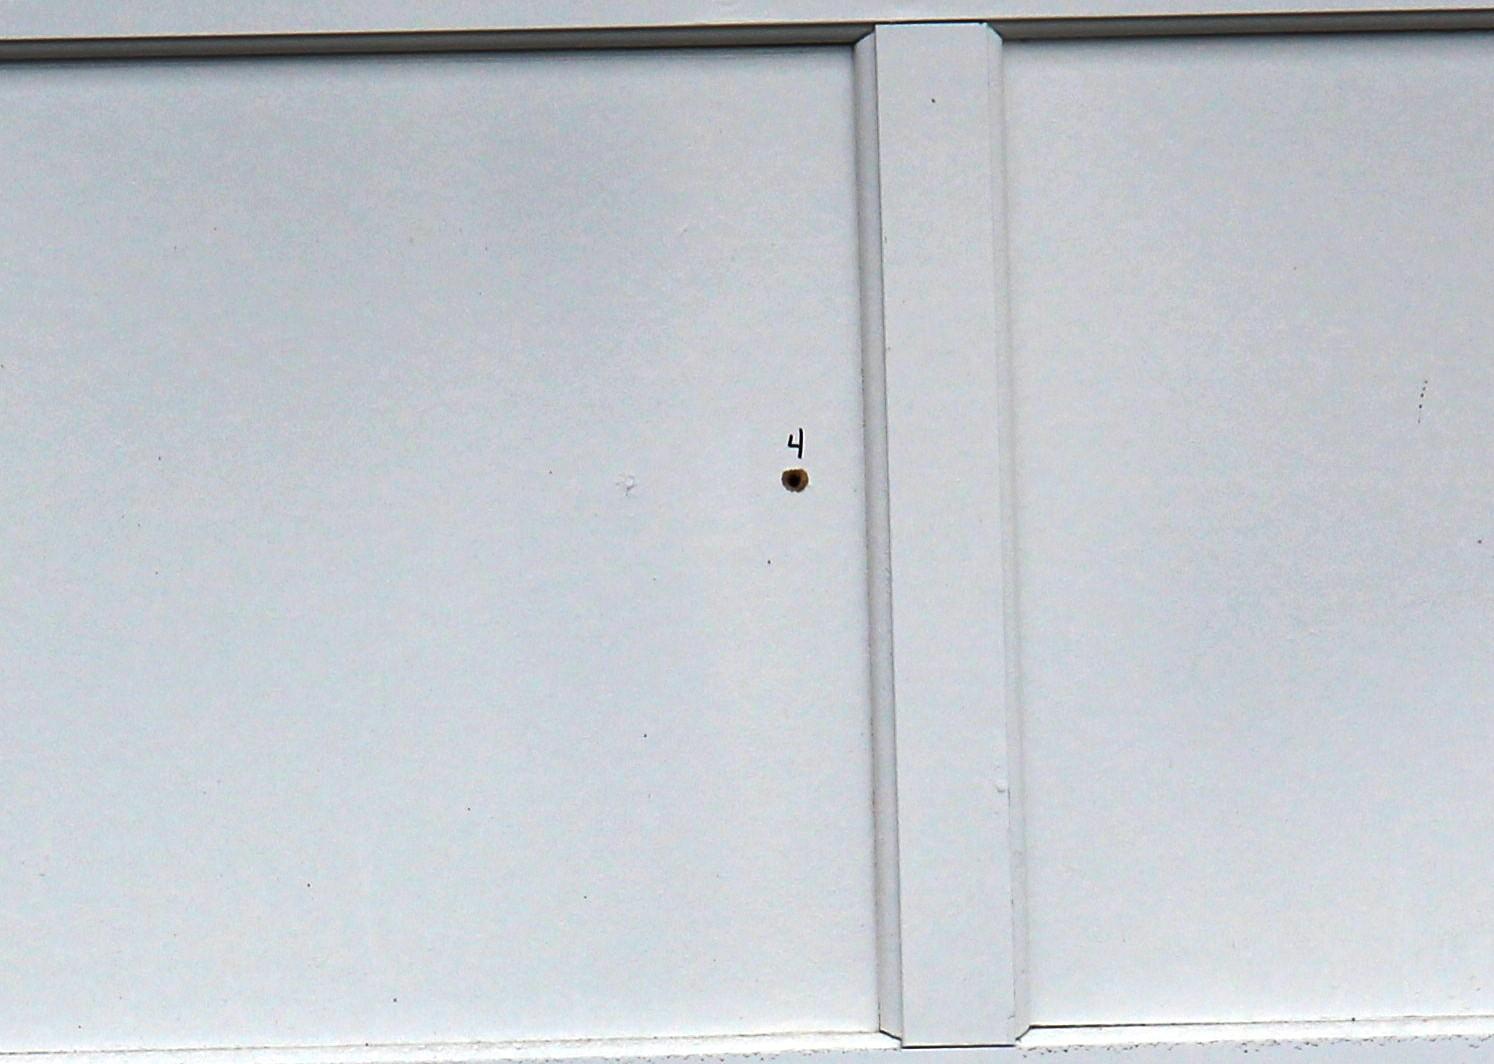 Drive by shootings rattle southwest everett neighborhood a bullet hole is visible in a garage door rubansaba